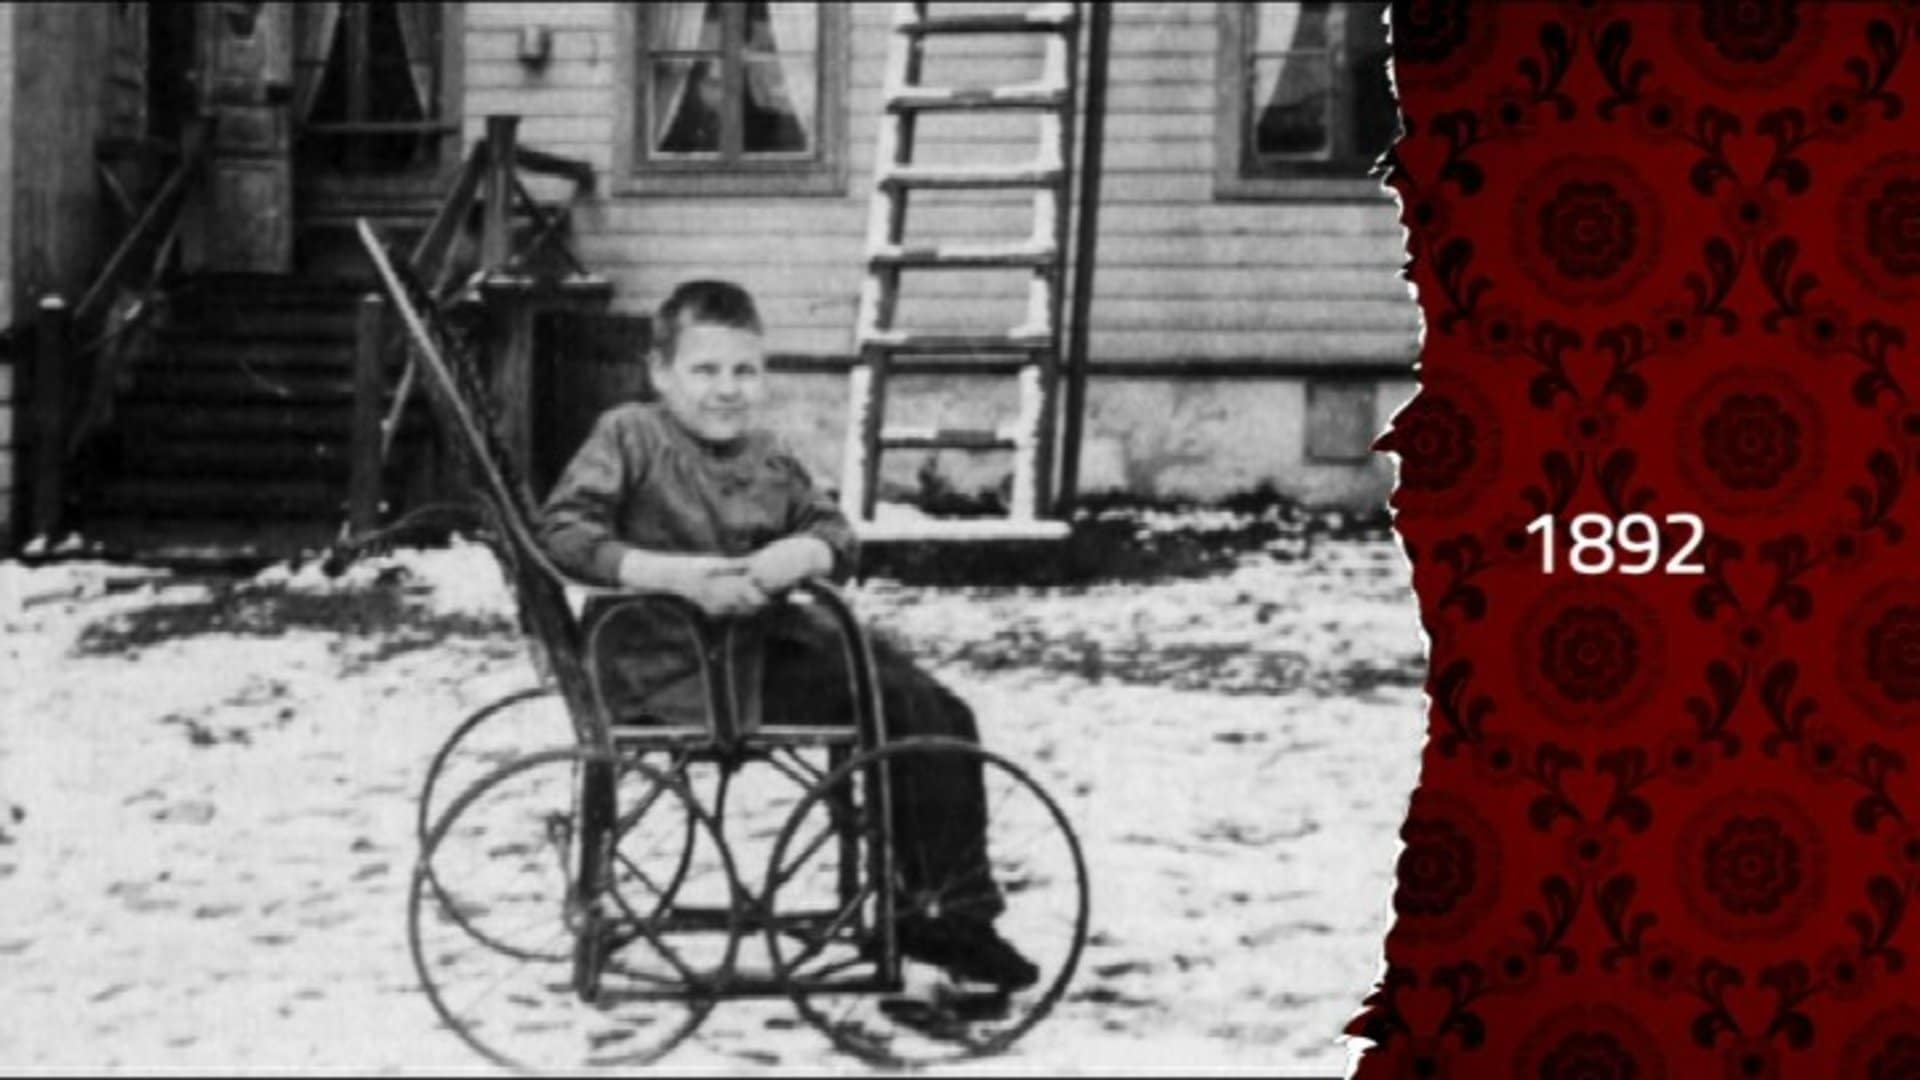 Arkistosta revittyä | Arkistosta revittyä: Pyörätuoli